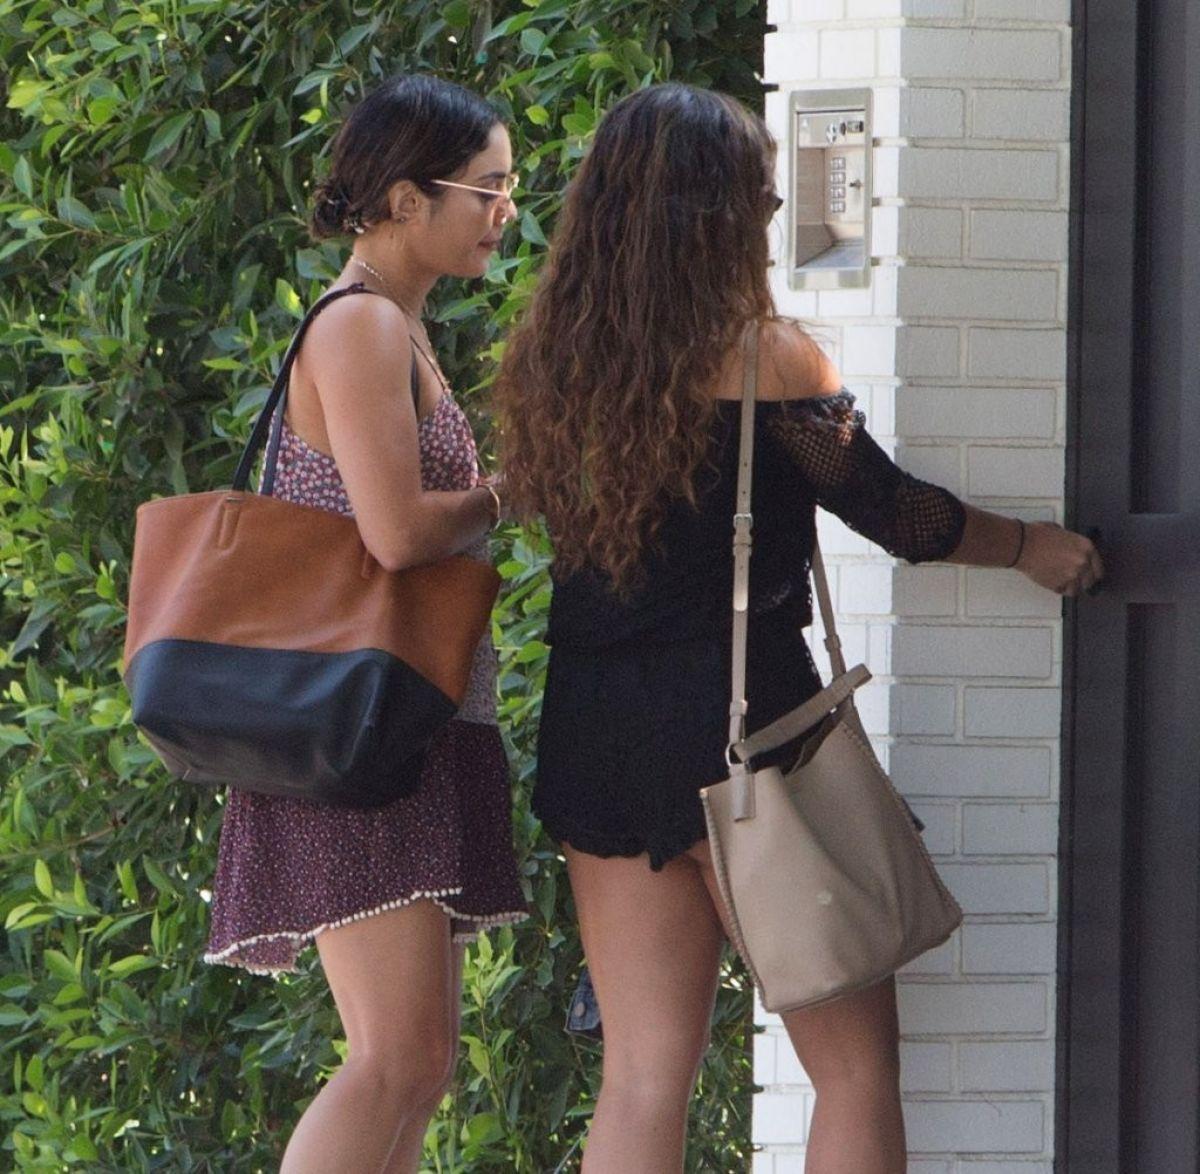 nude Legs Vanessa, Stella Hudgens Ashley Tisdale (56 images) Selfie, YouTube, swimsuit